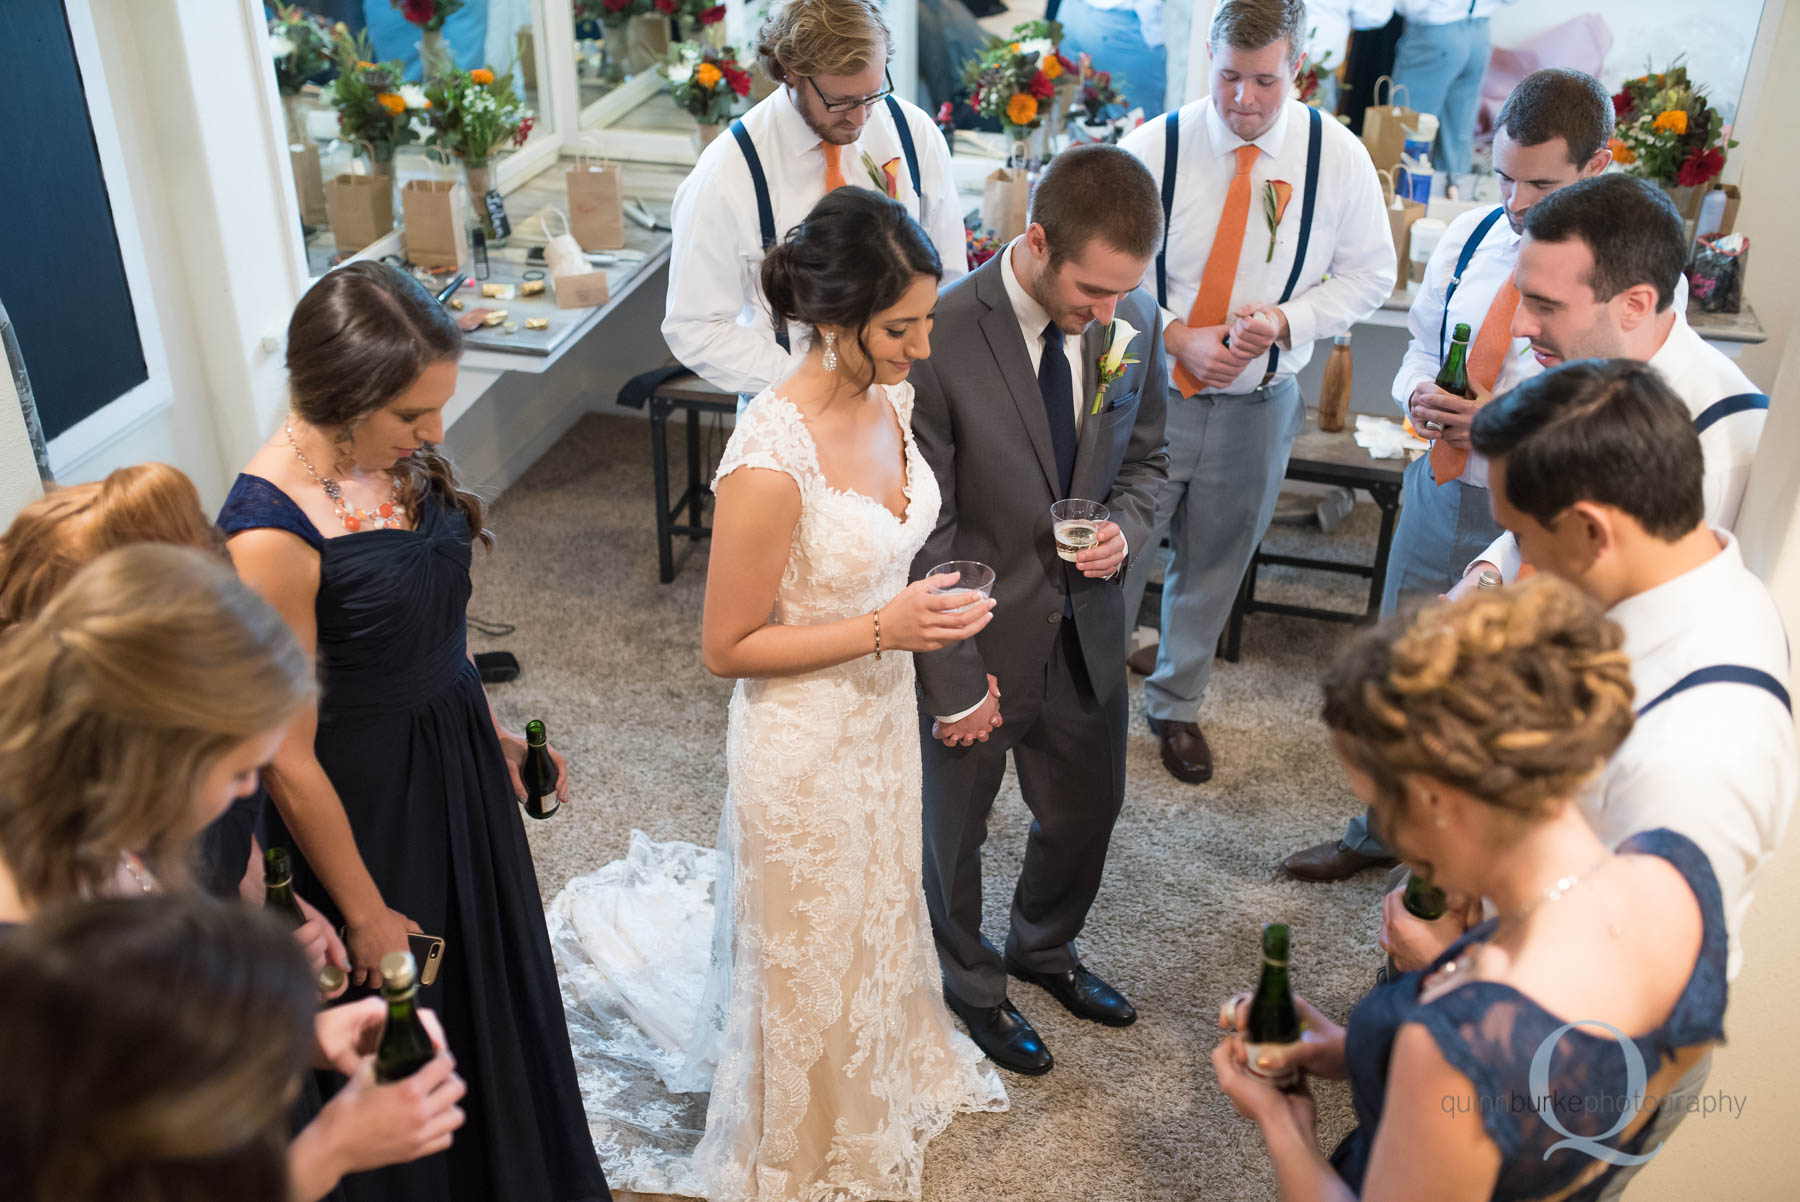 praying for bride and groom before wedding at Green Villa Barn